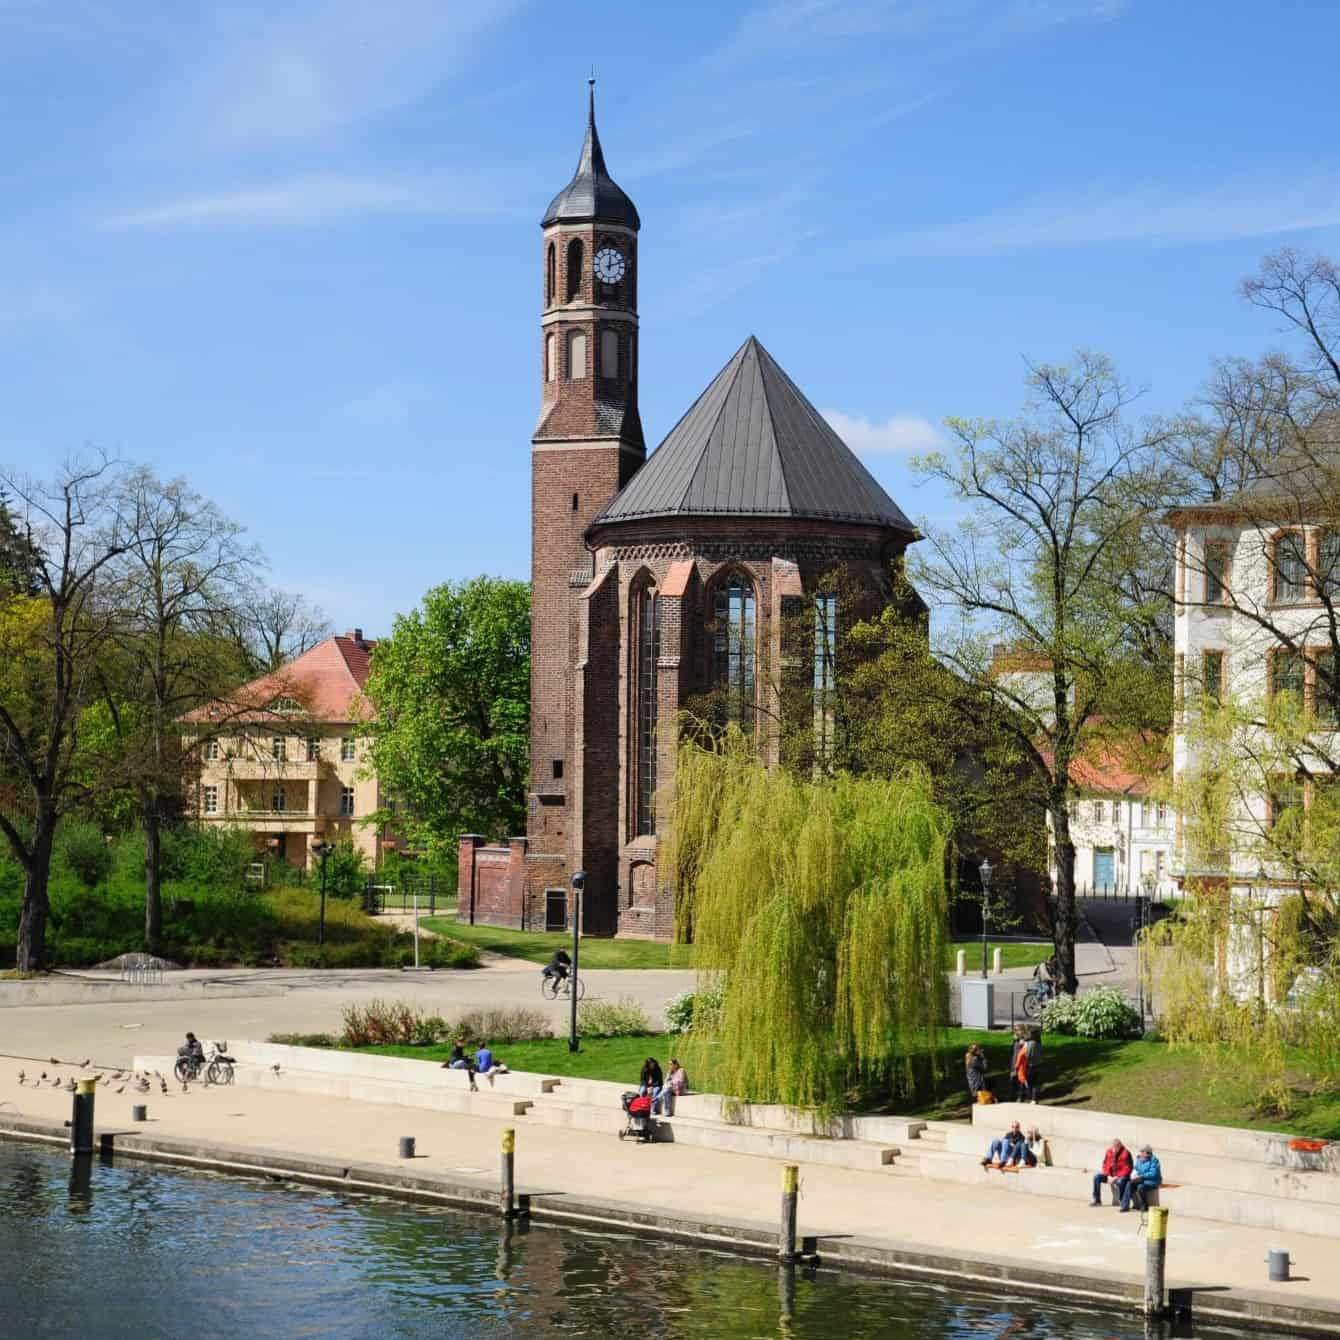 johanniskirche-brandenburg